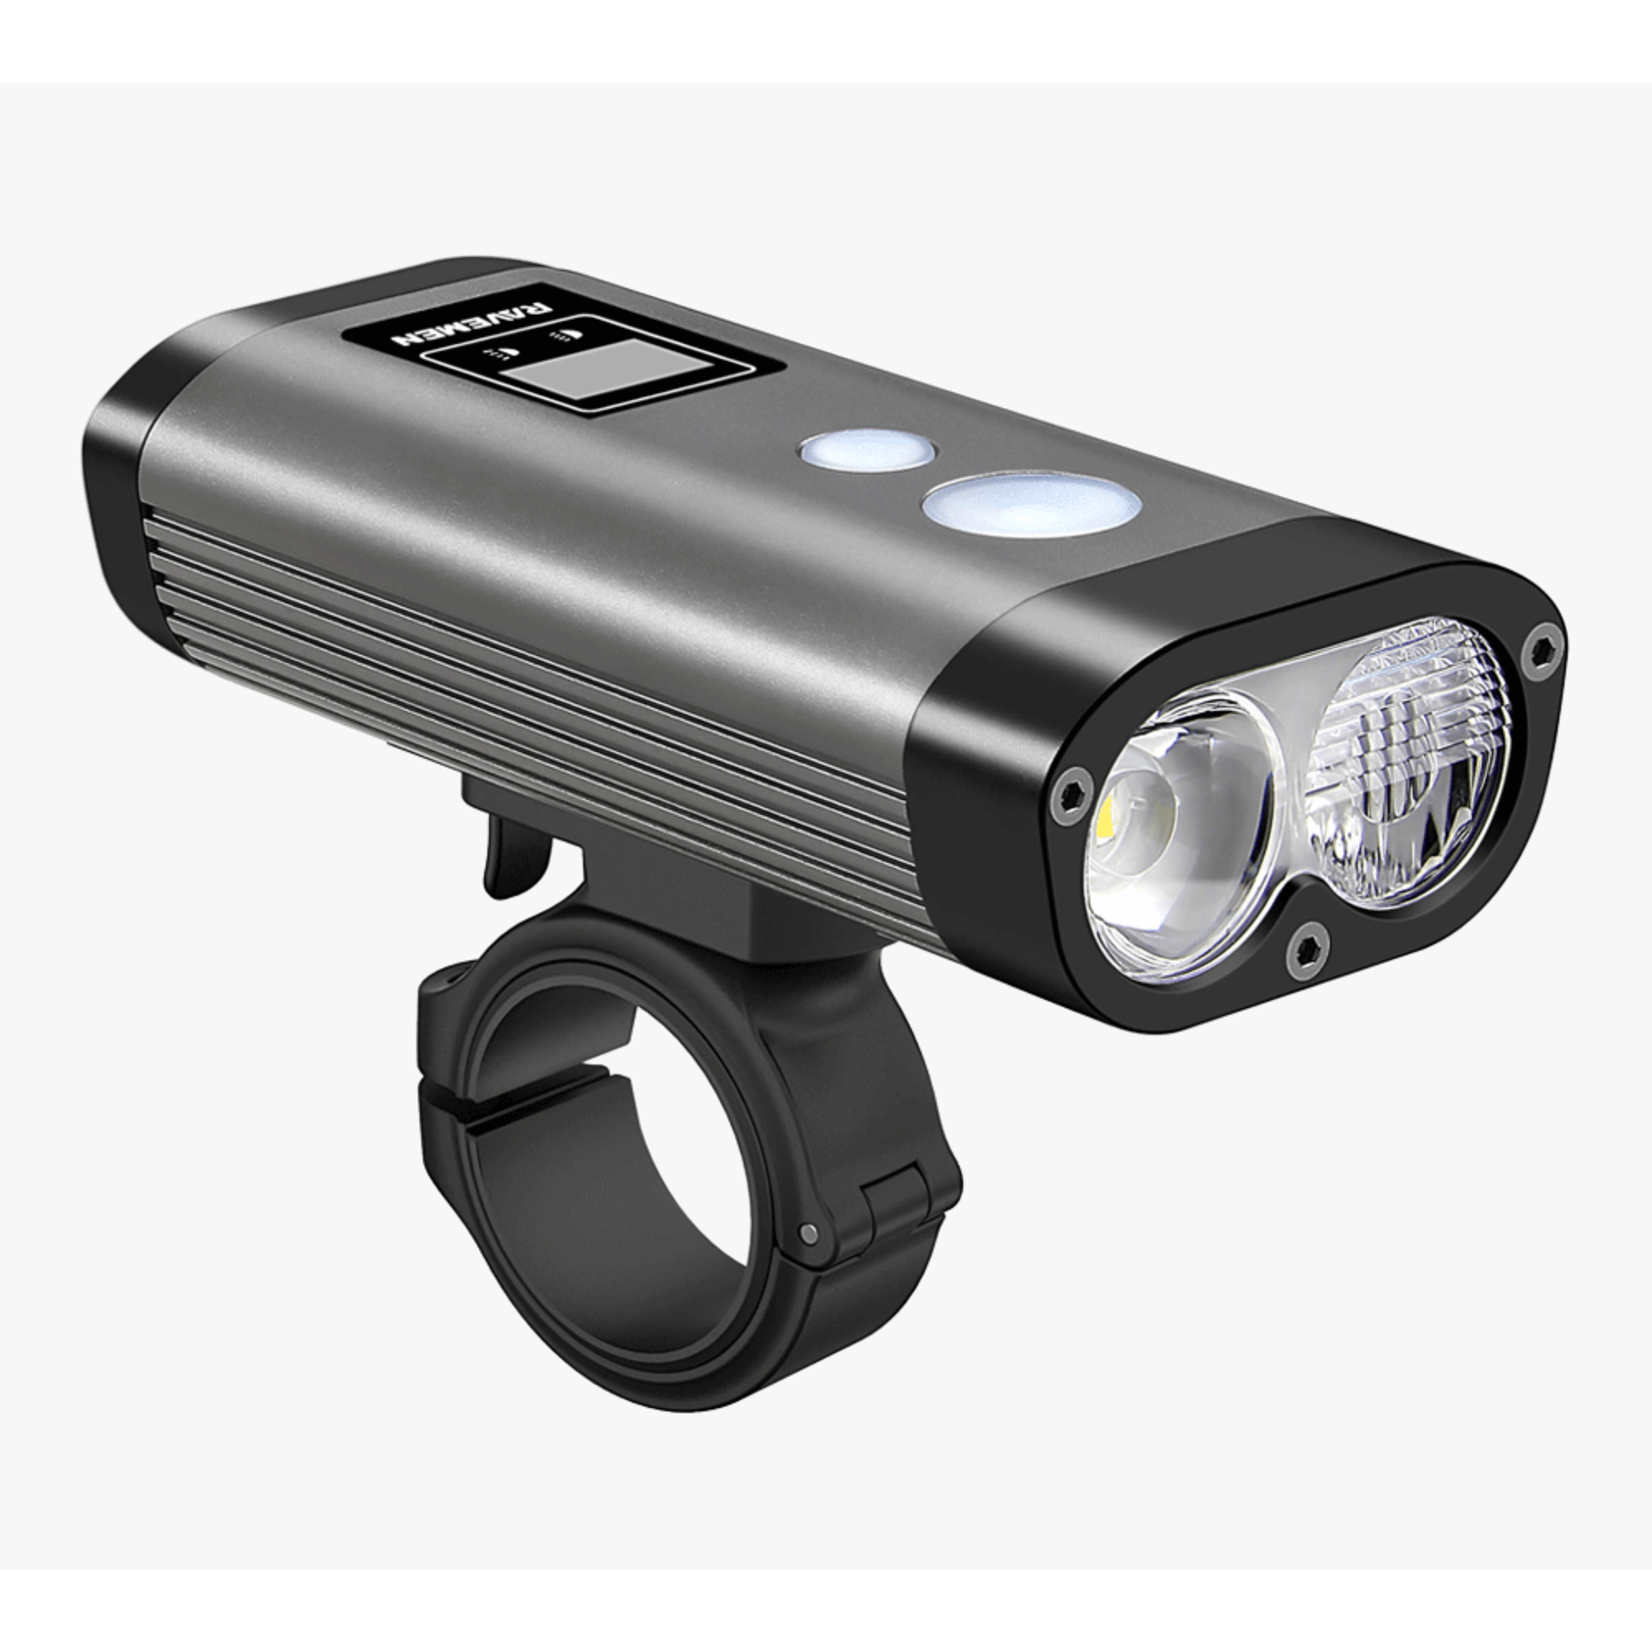 RAVEMAN PR1200 LIGHT